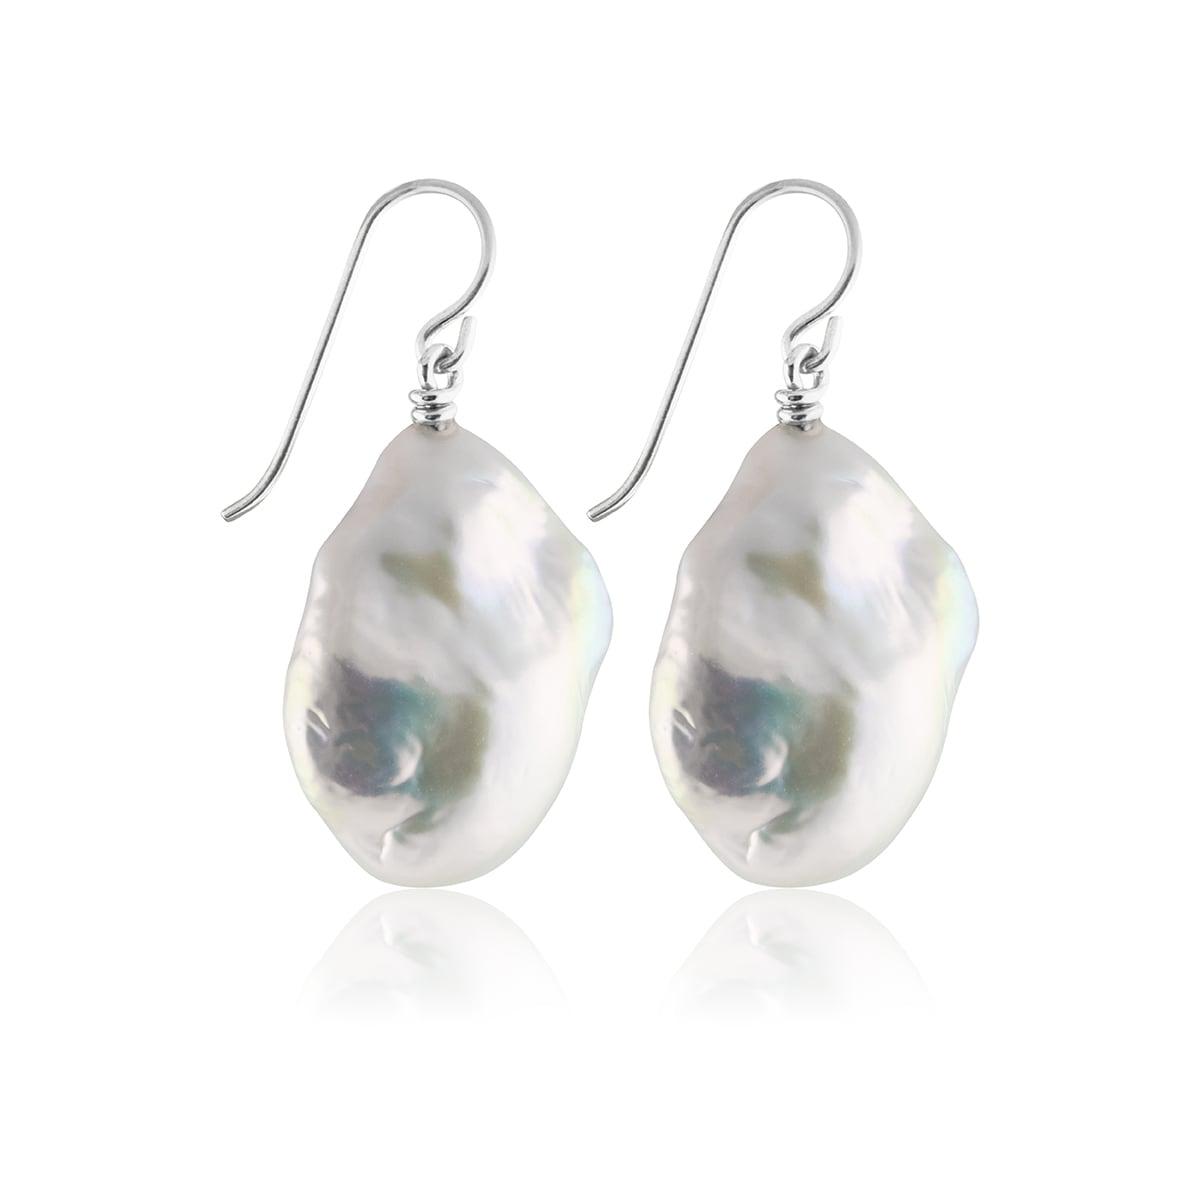 Sophie_by_Sophie_Baroque_earrings_E1893RHPE-OS_hos_Jarl_Sandin